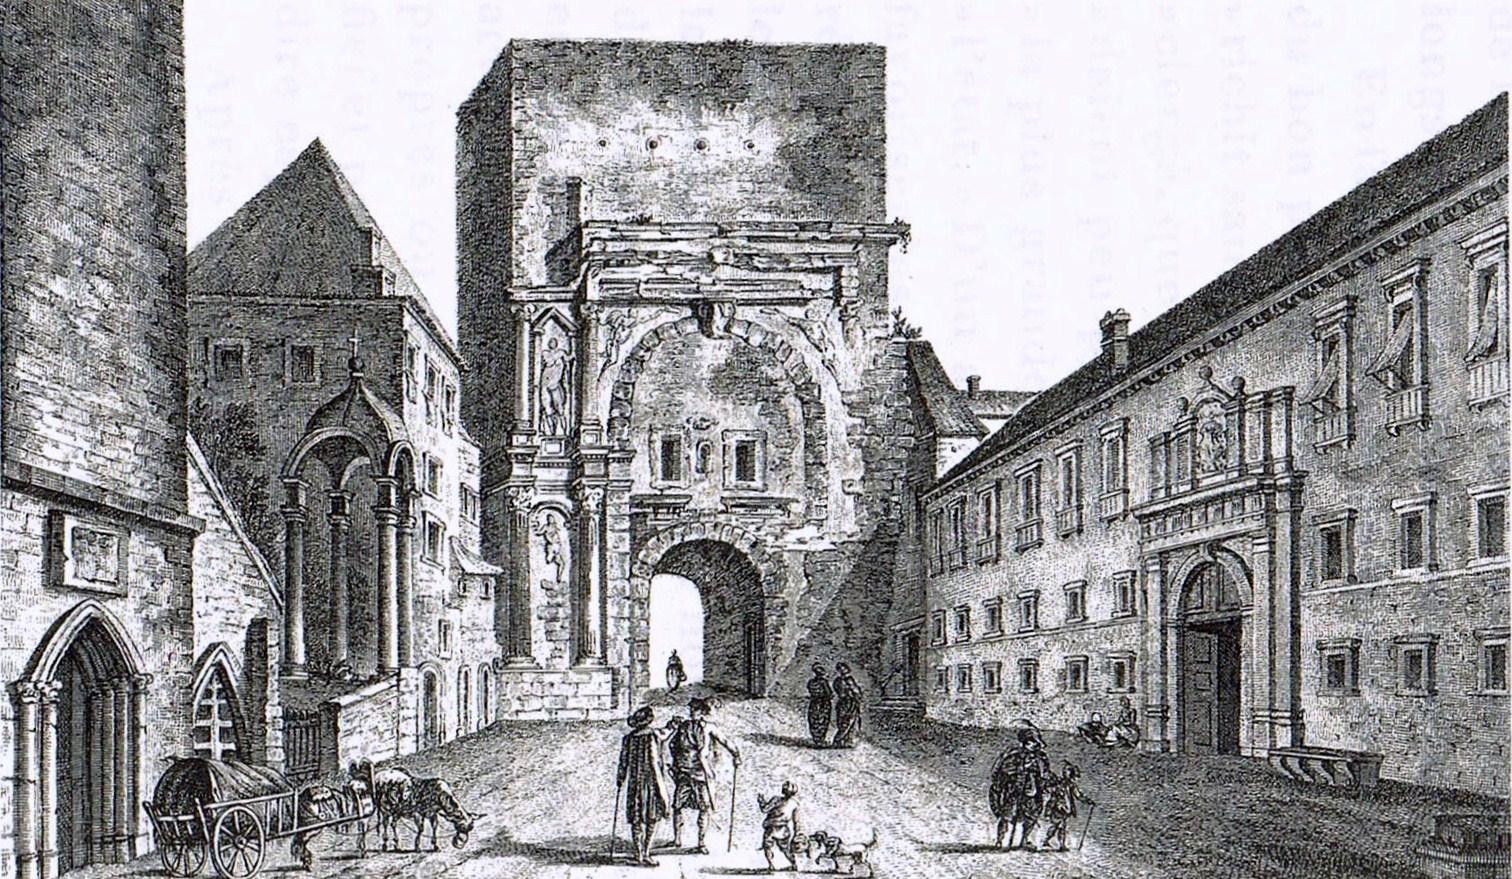 File:Porte Noire 1825 - Besançon.jpg